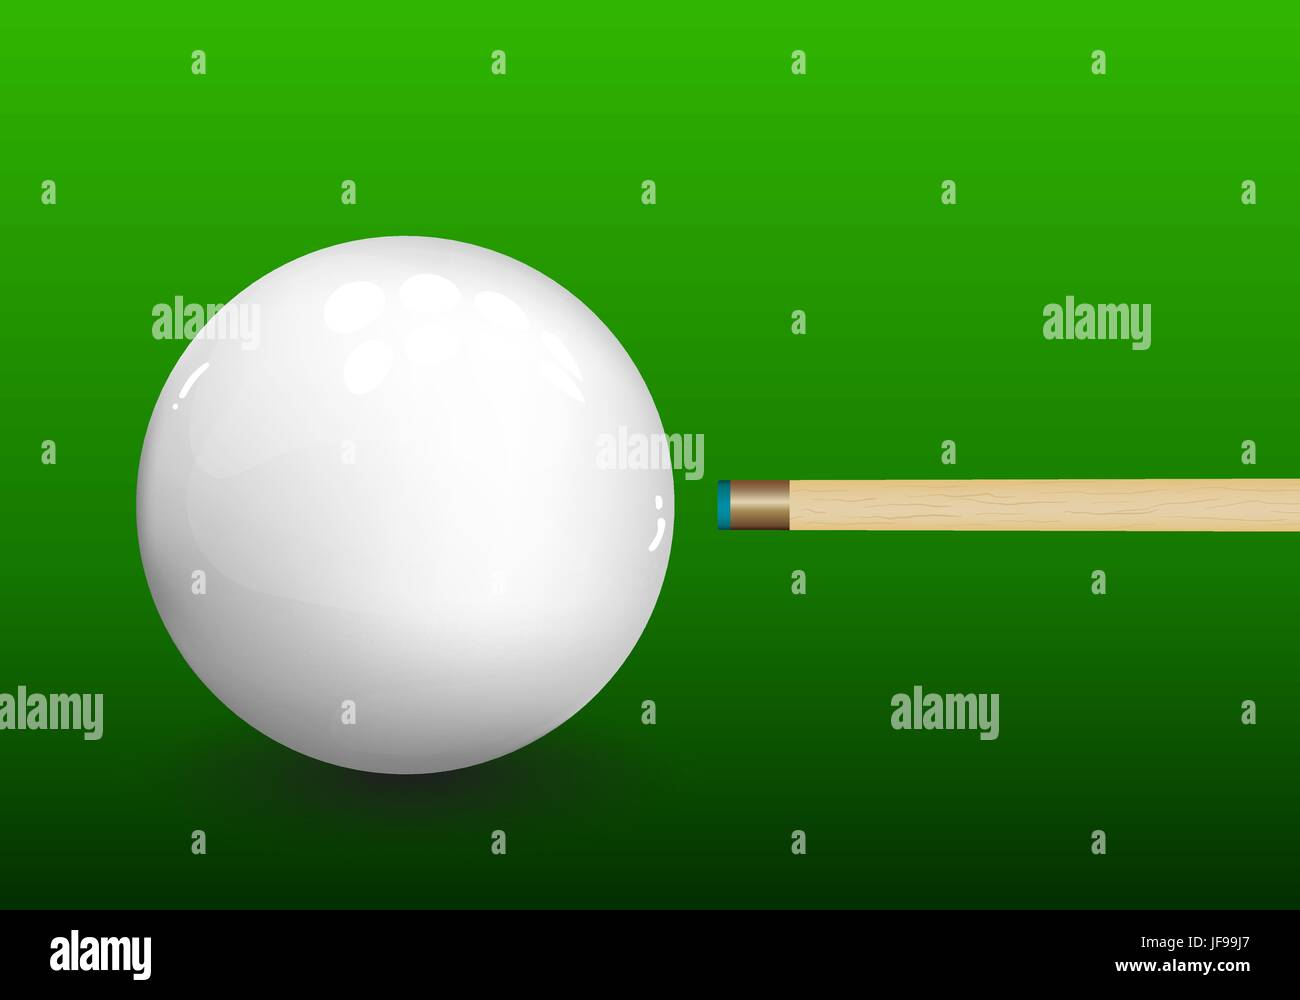 Billiard Cue Aiming on Ball - Stock Vector